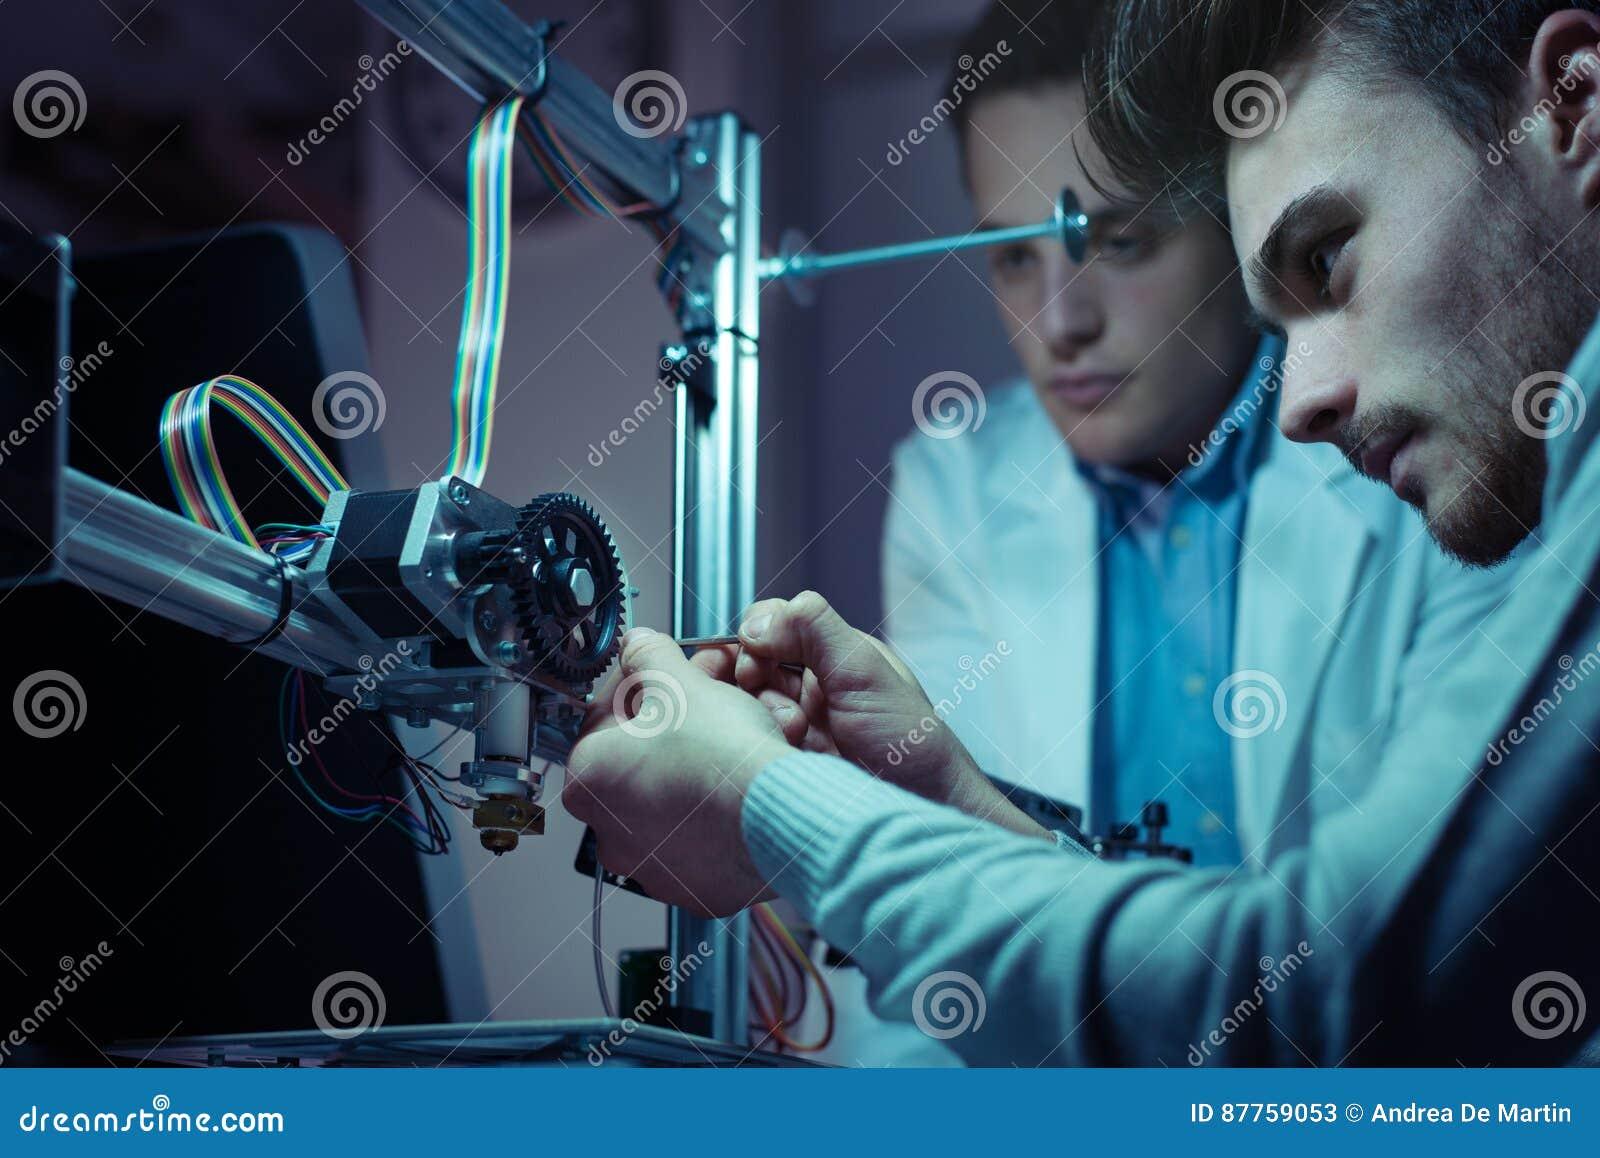 Dirigir al equipo que trabaja en una impresora 3D